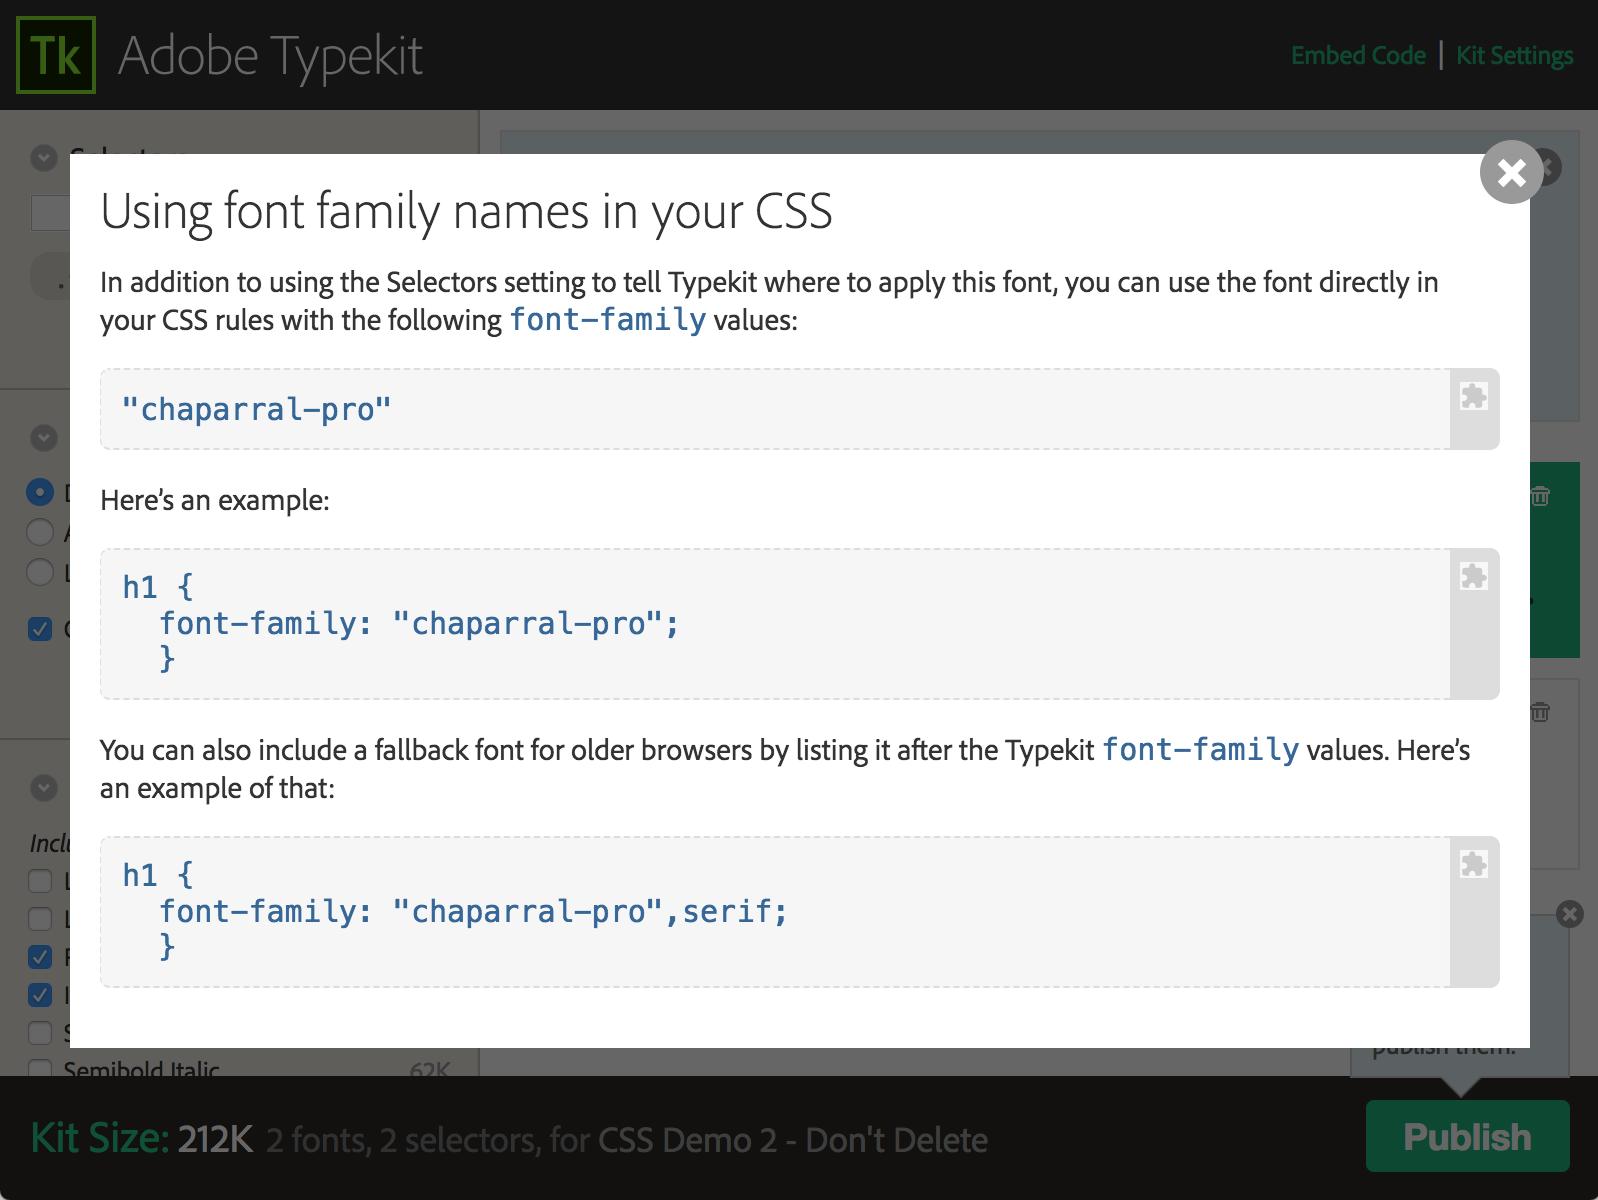 Font Family name values shown in kit editor